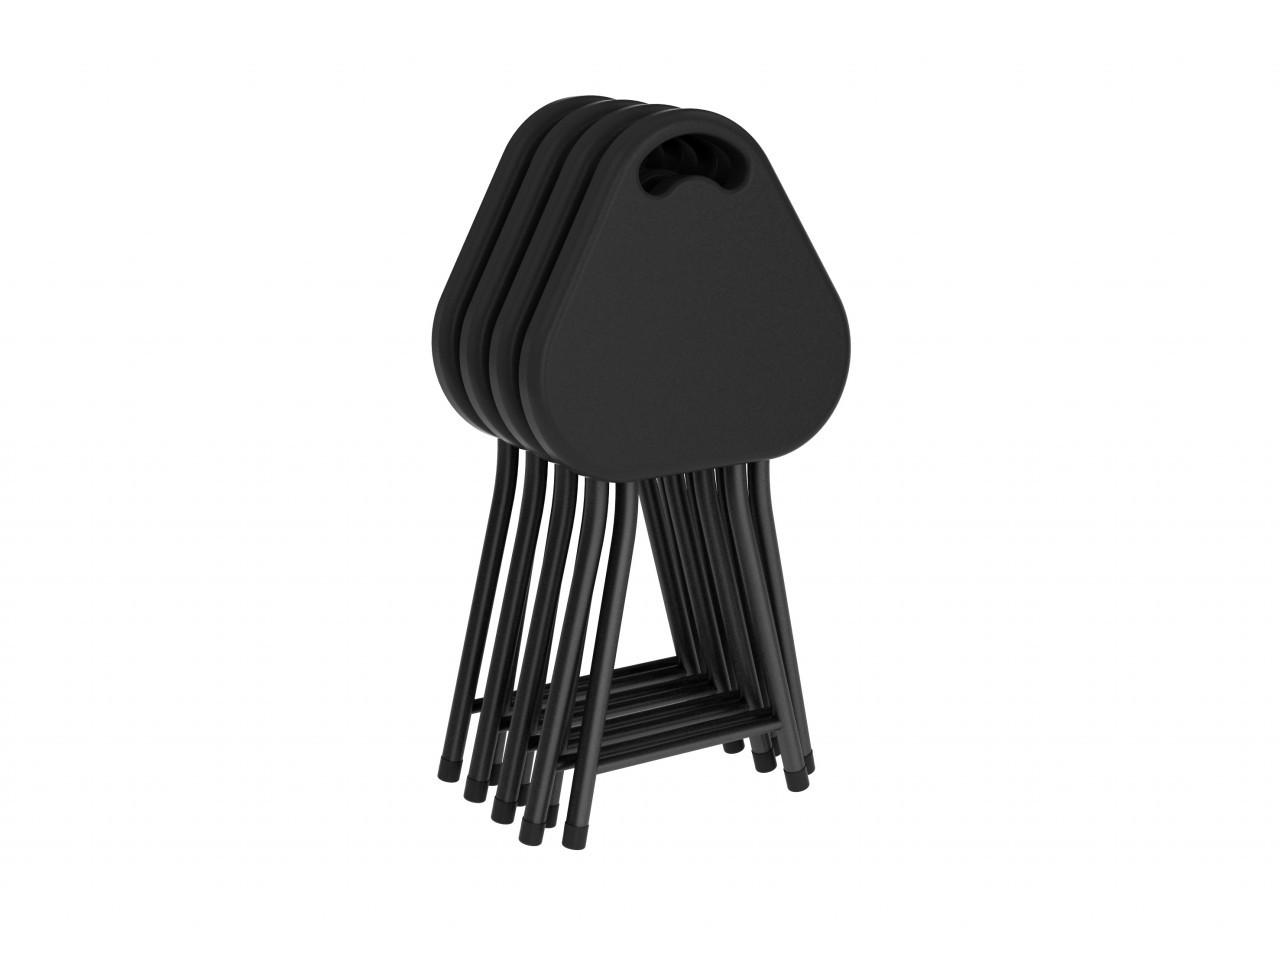 Folding Stool W Handle 4 Pack In Black Atlantic Inc